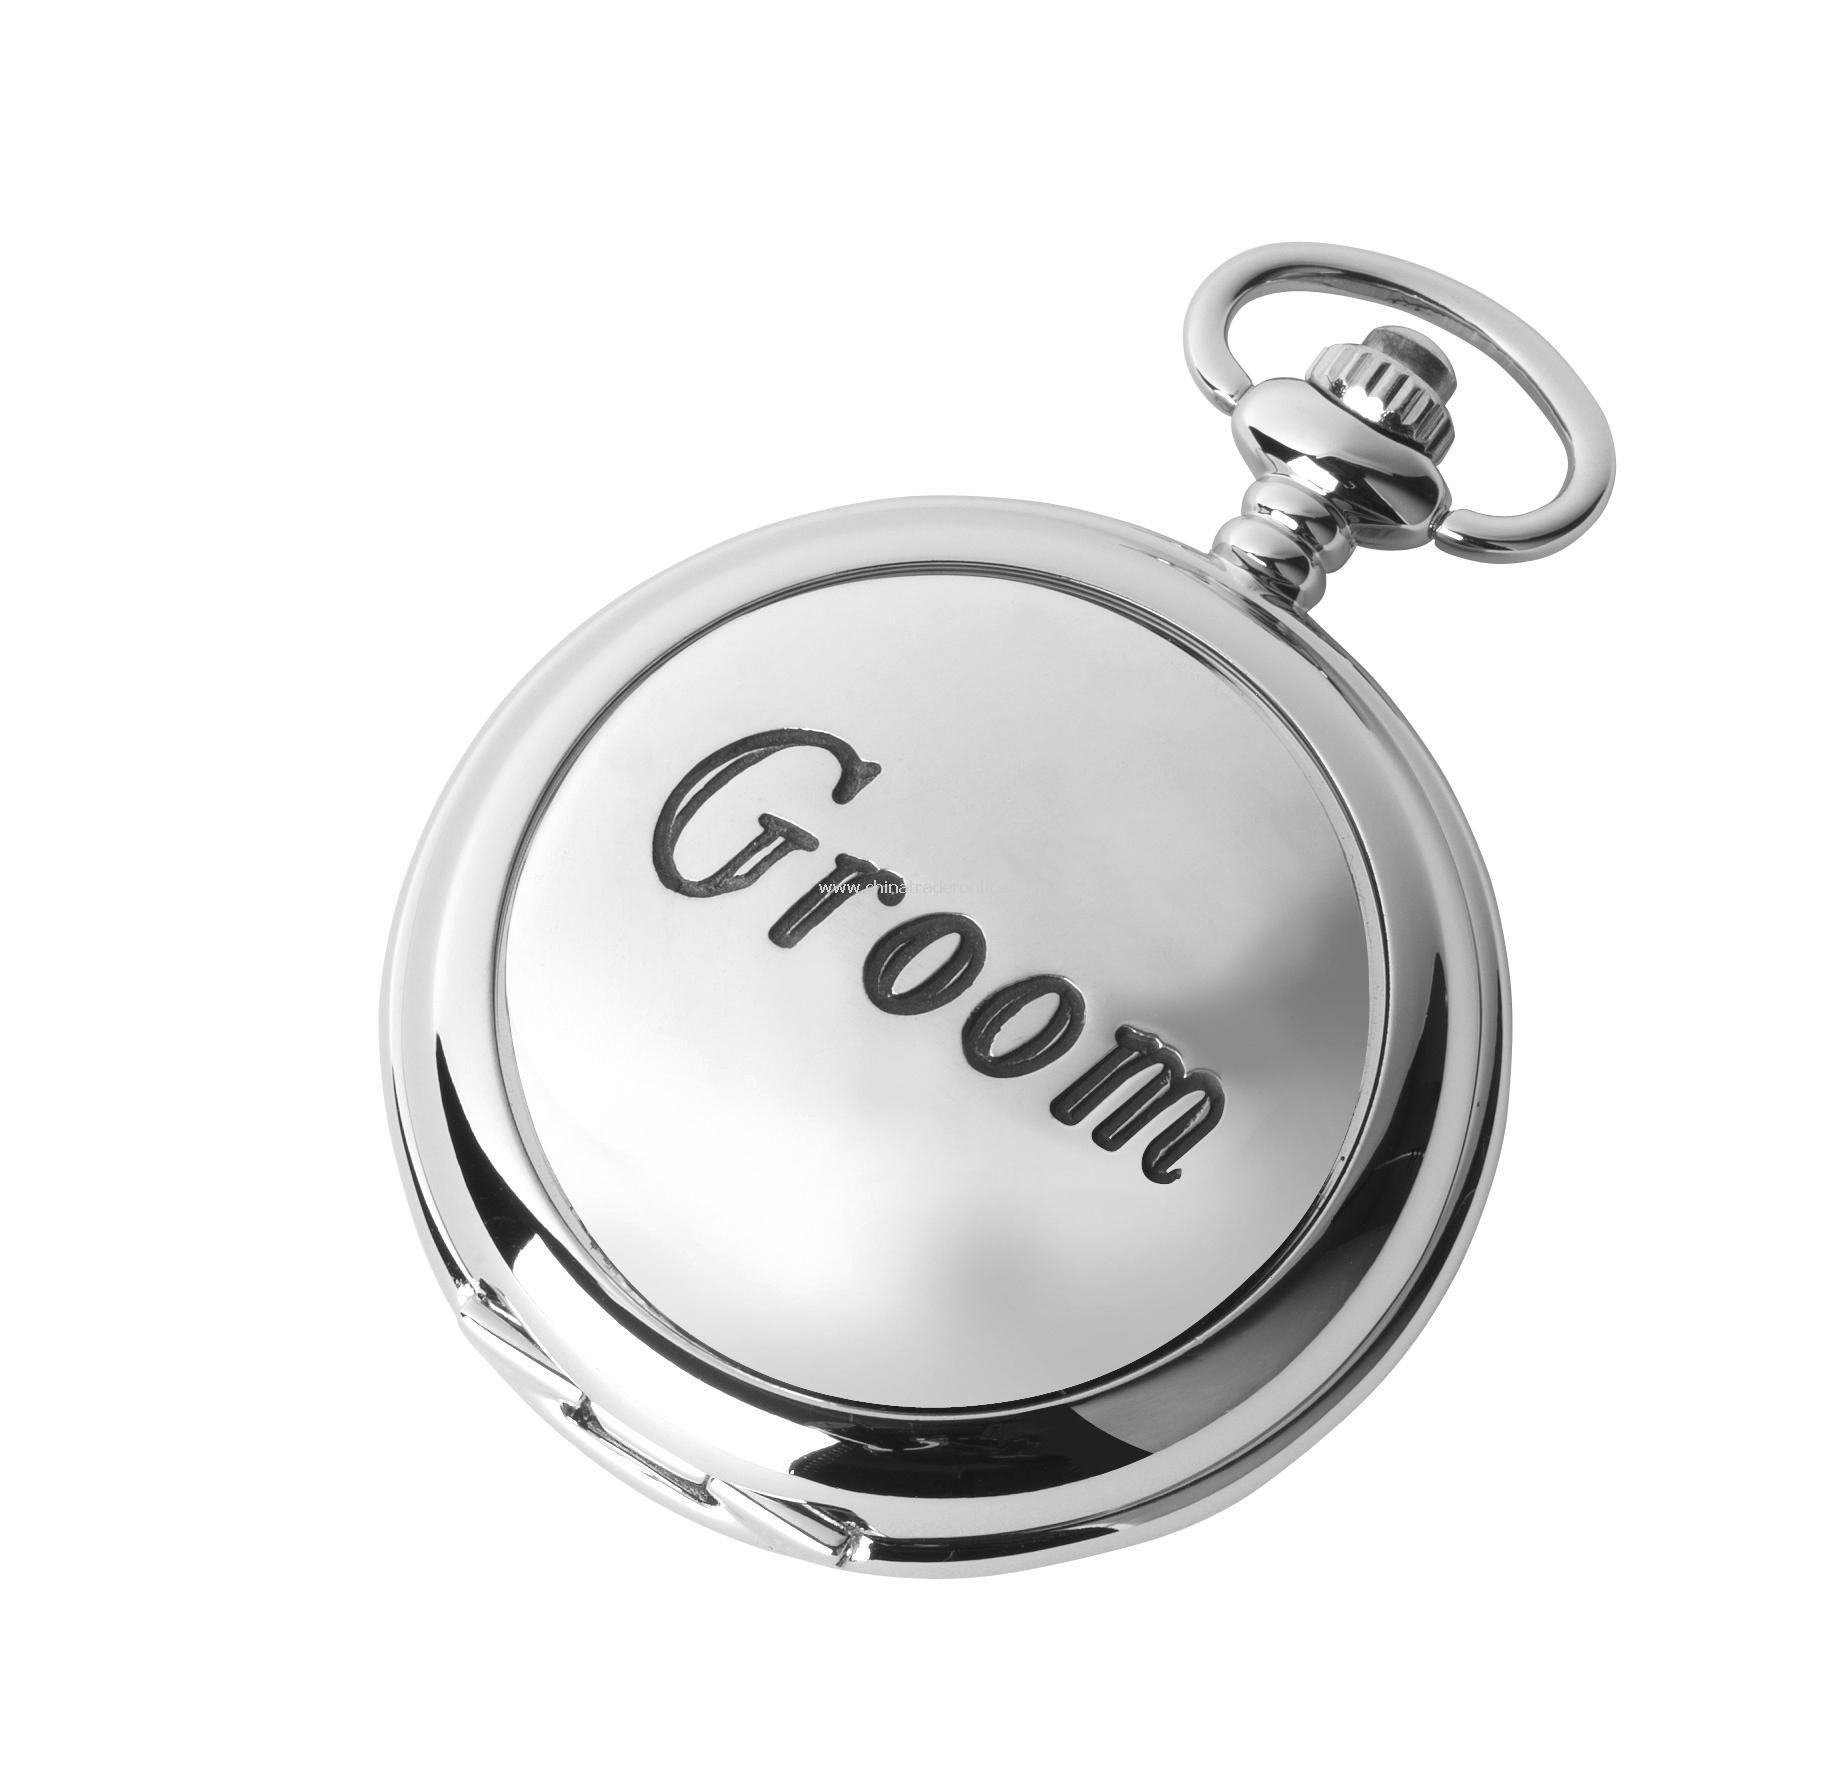 Groom Fob Watch